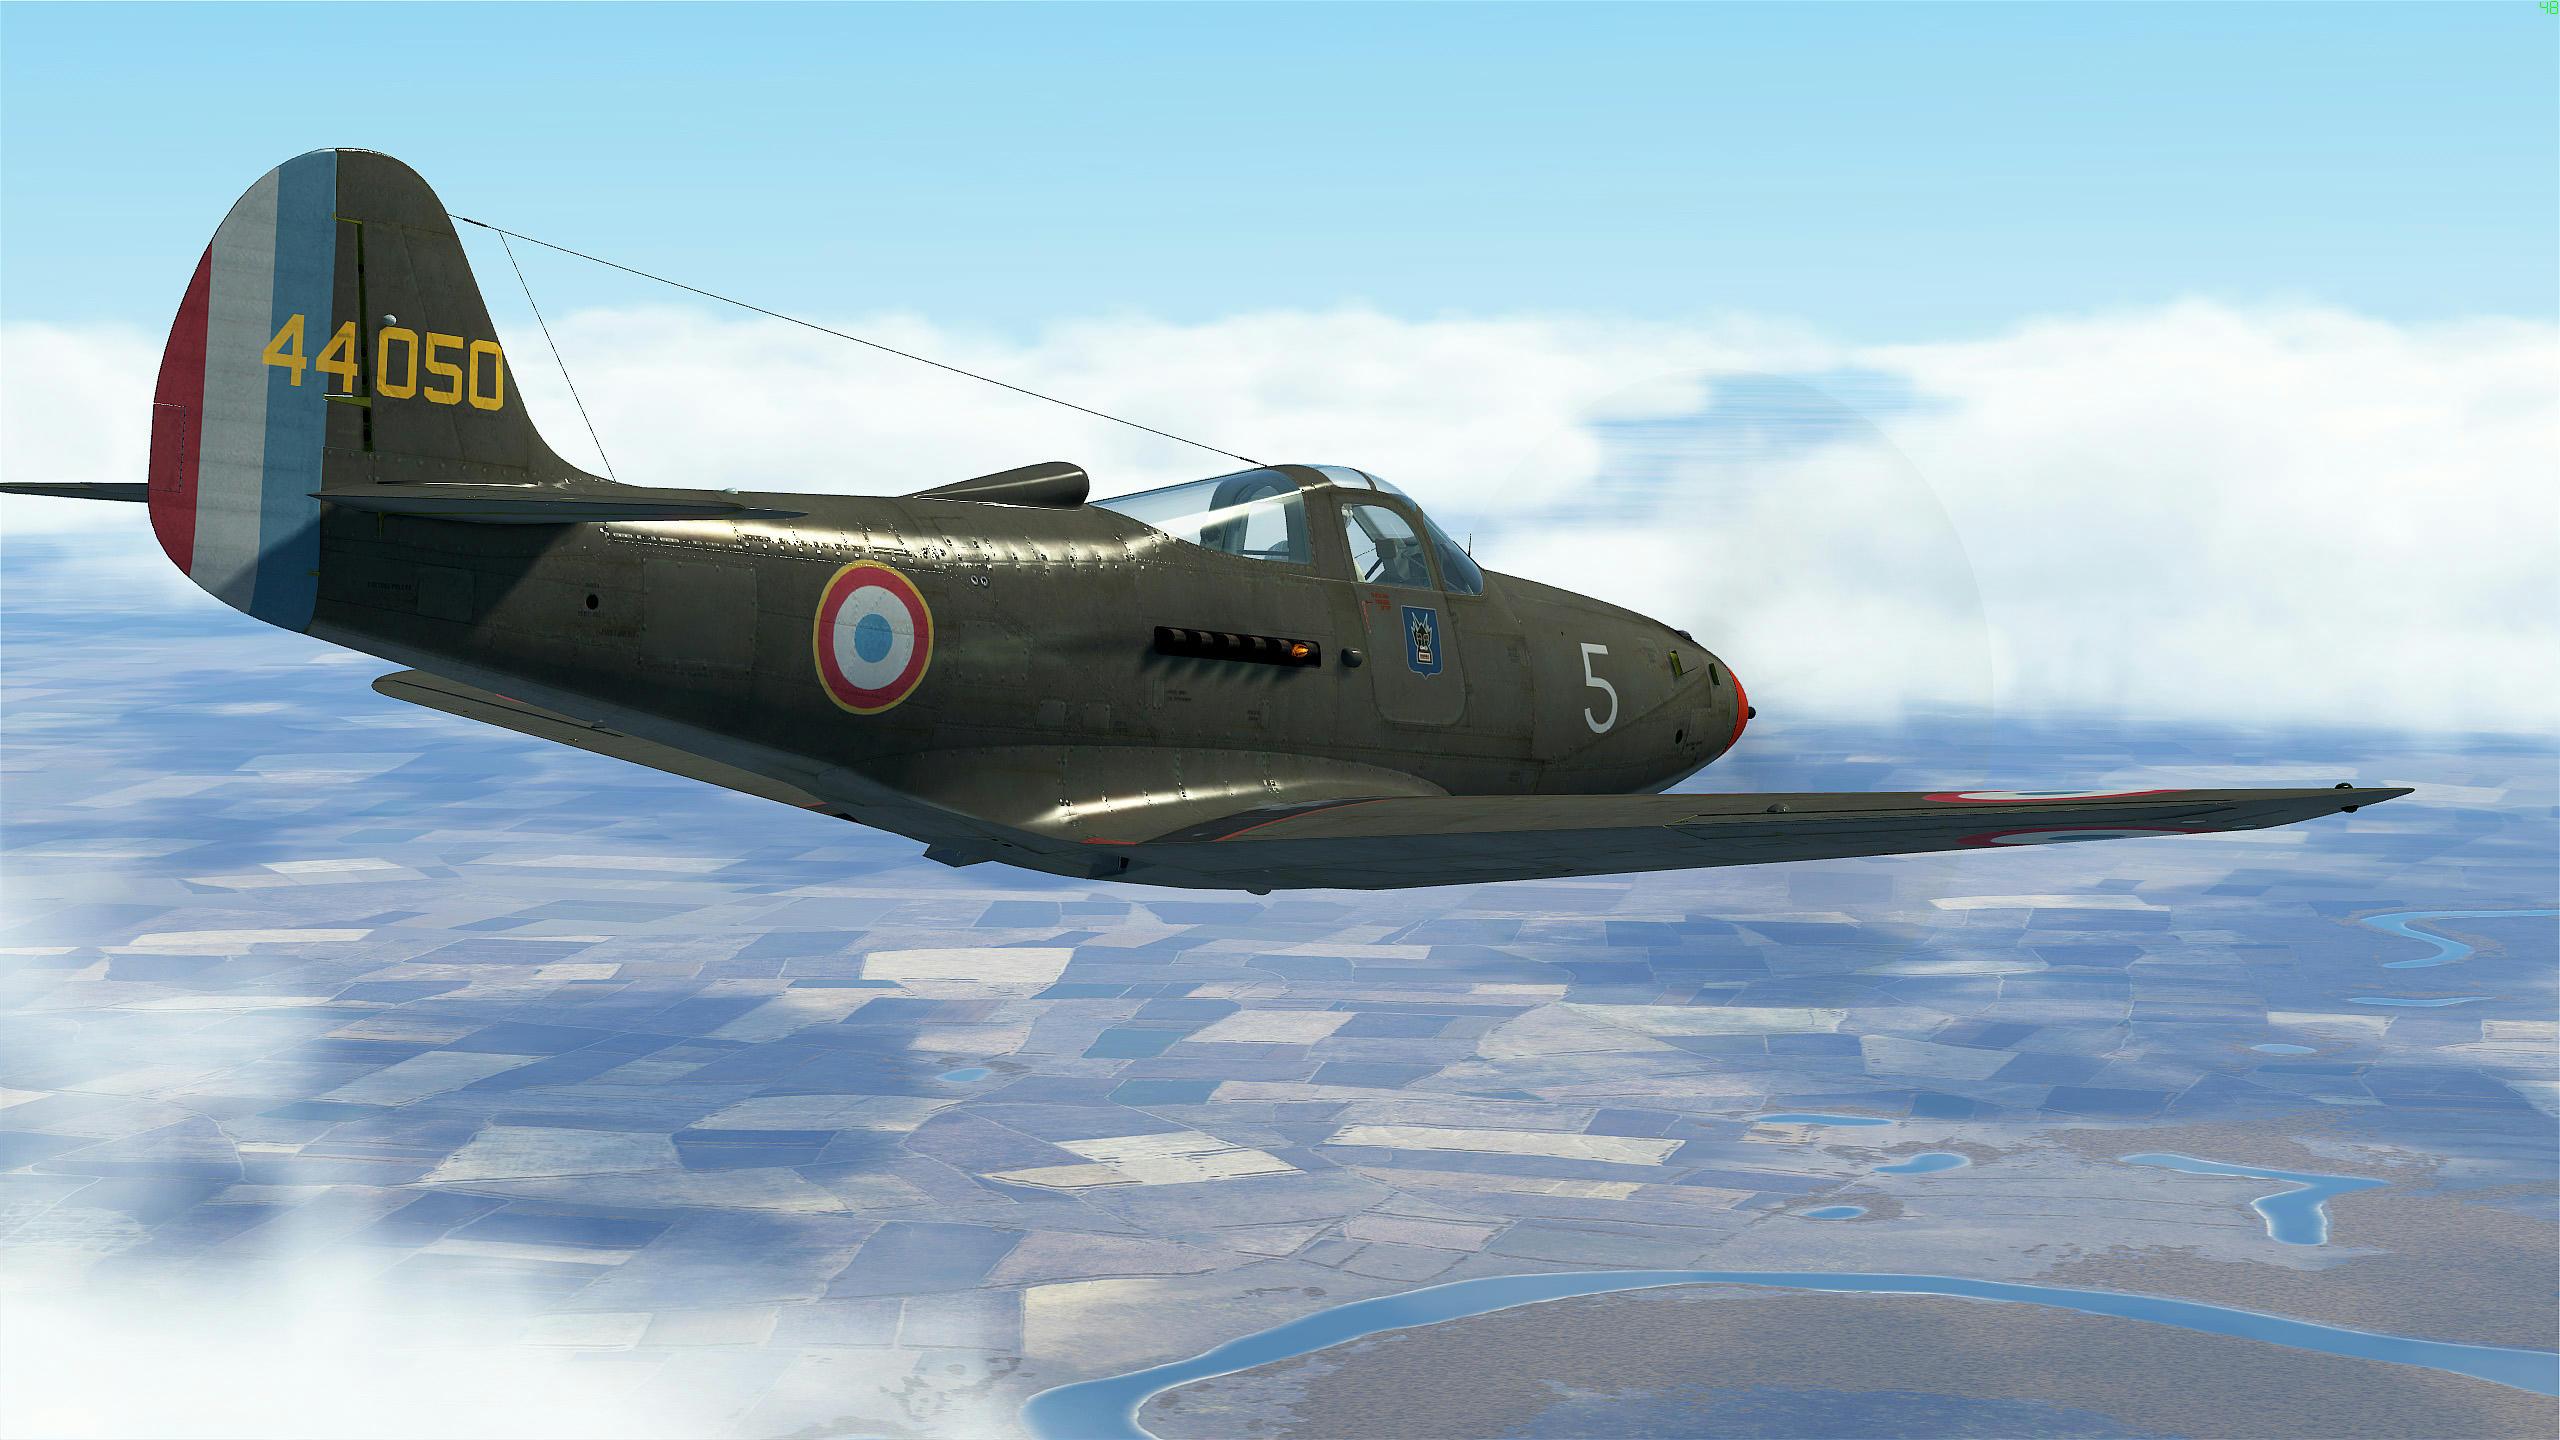 PACK P-39 FRANCAIS 9lb8sb1p6wbw3thzg